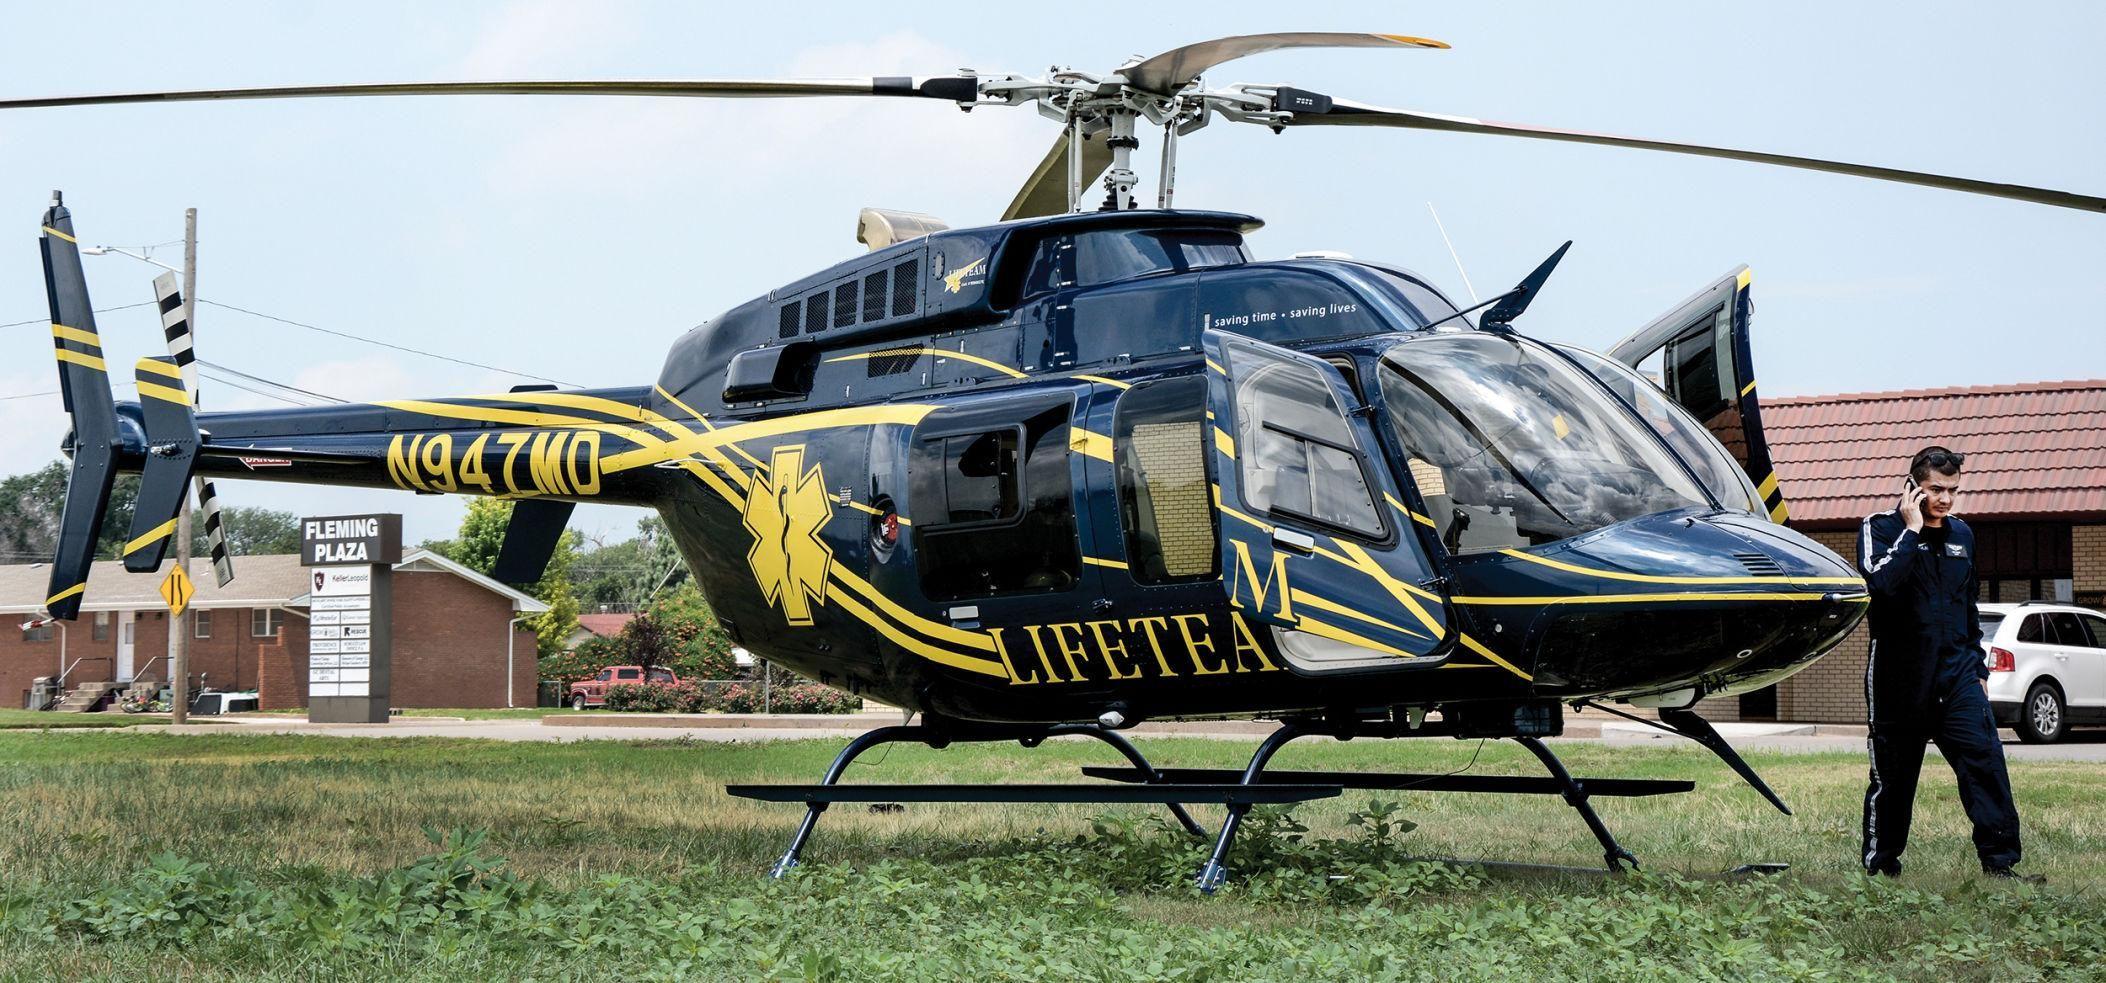 LifeTeam to host flight school at GCCC The Garden City